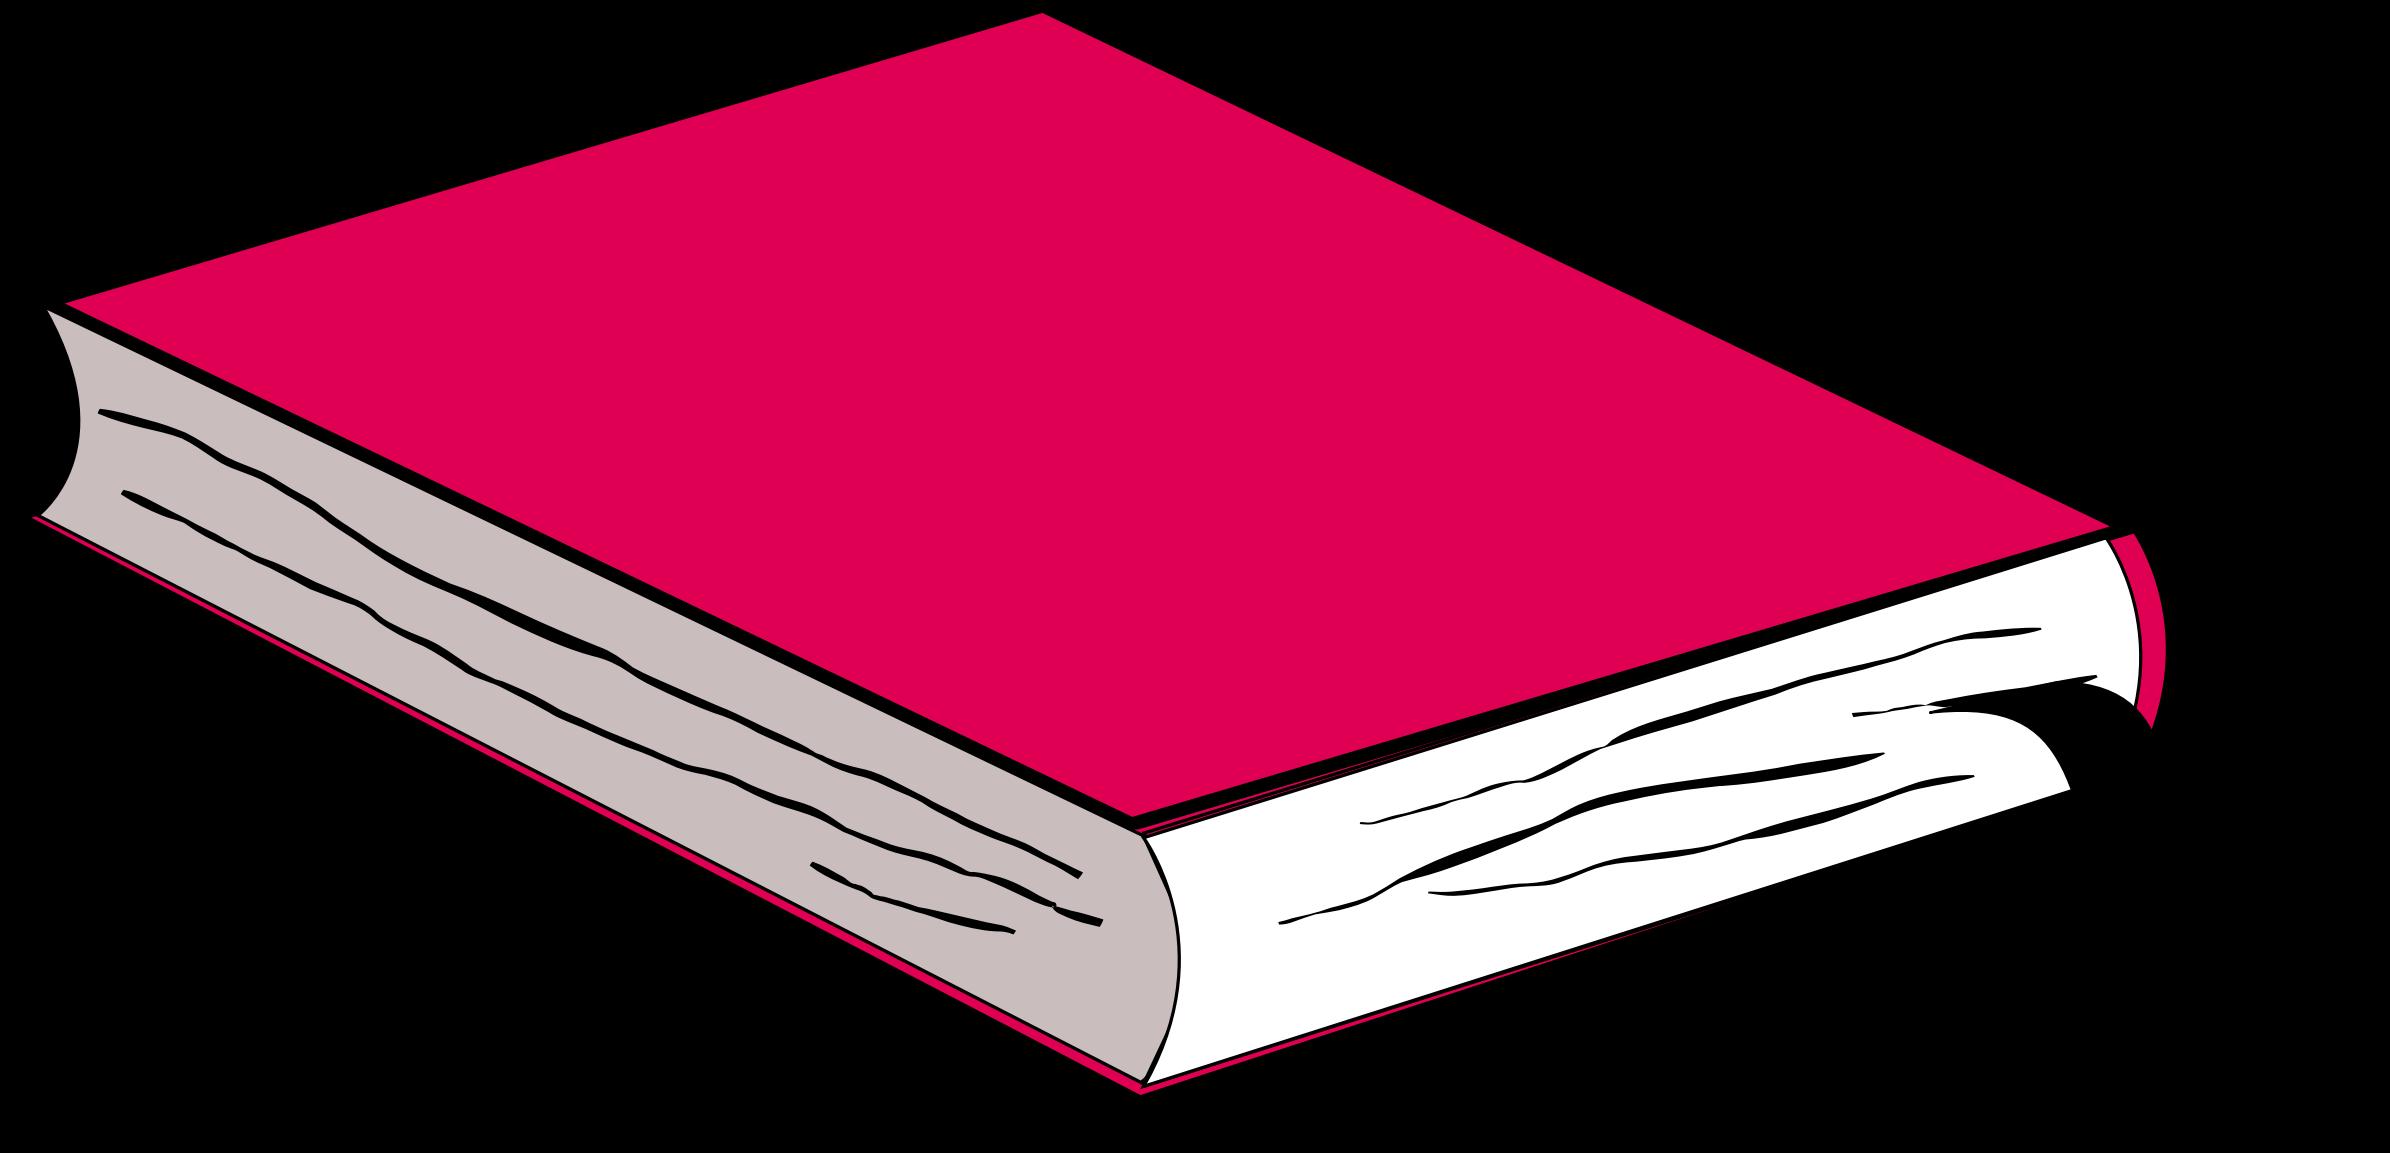 Pink no big image. Clipart book shadow